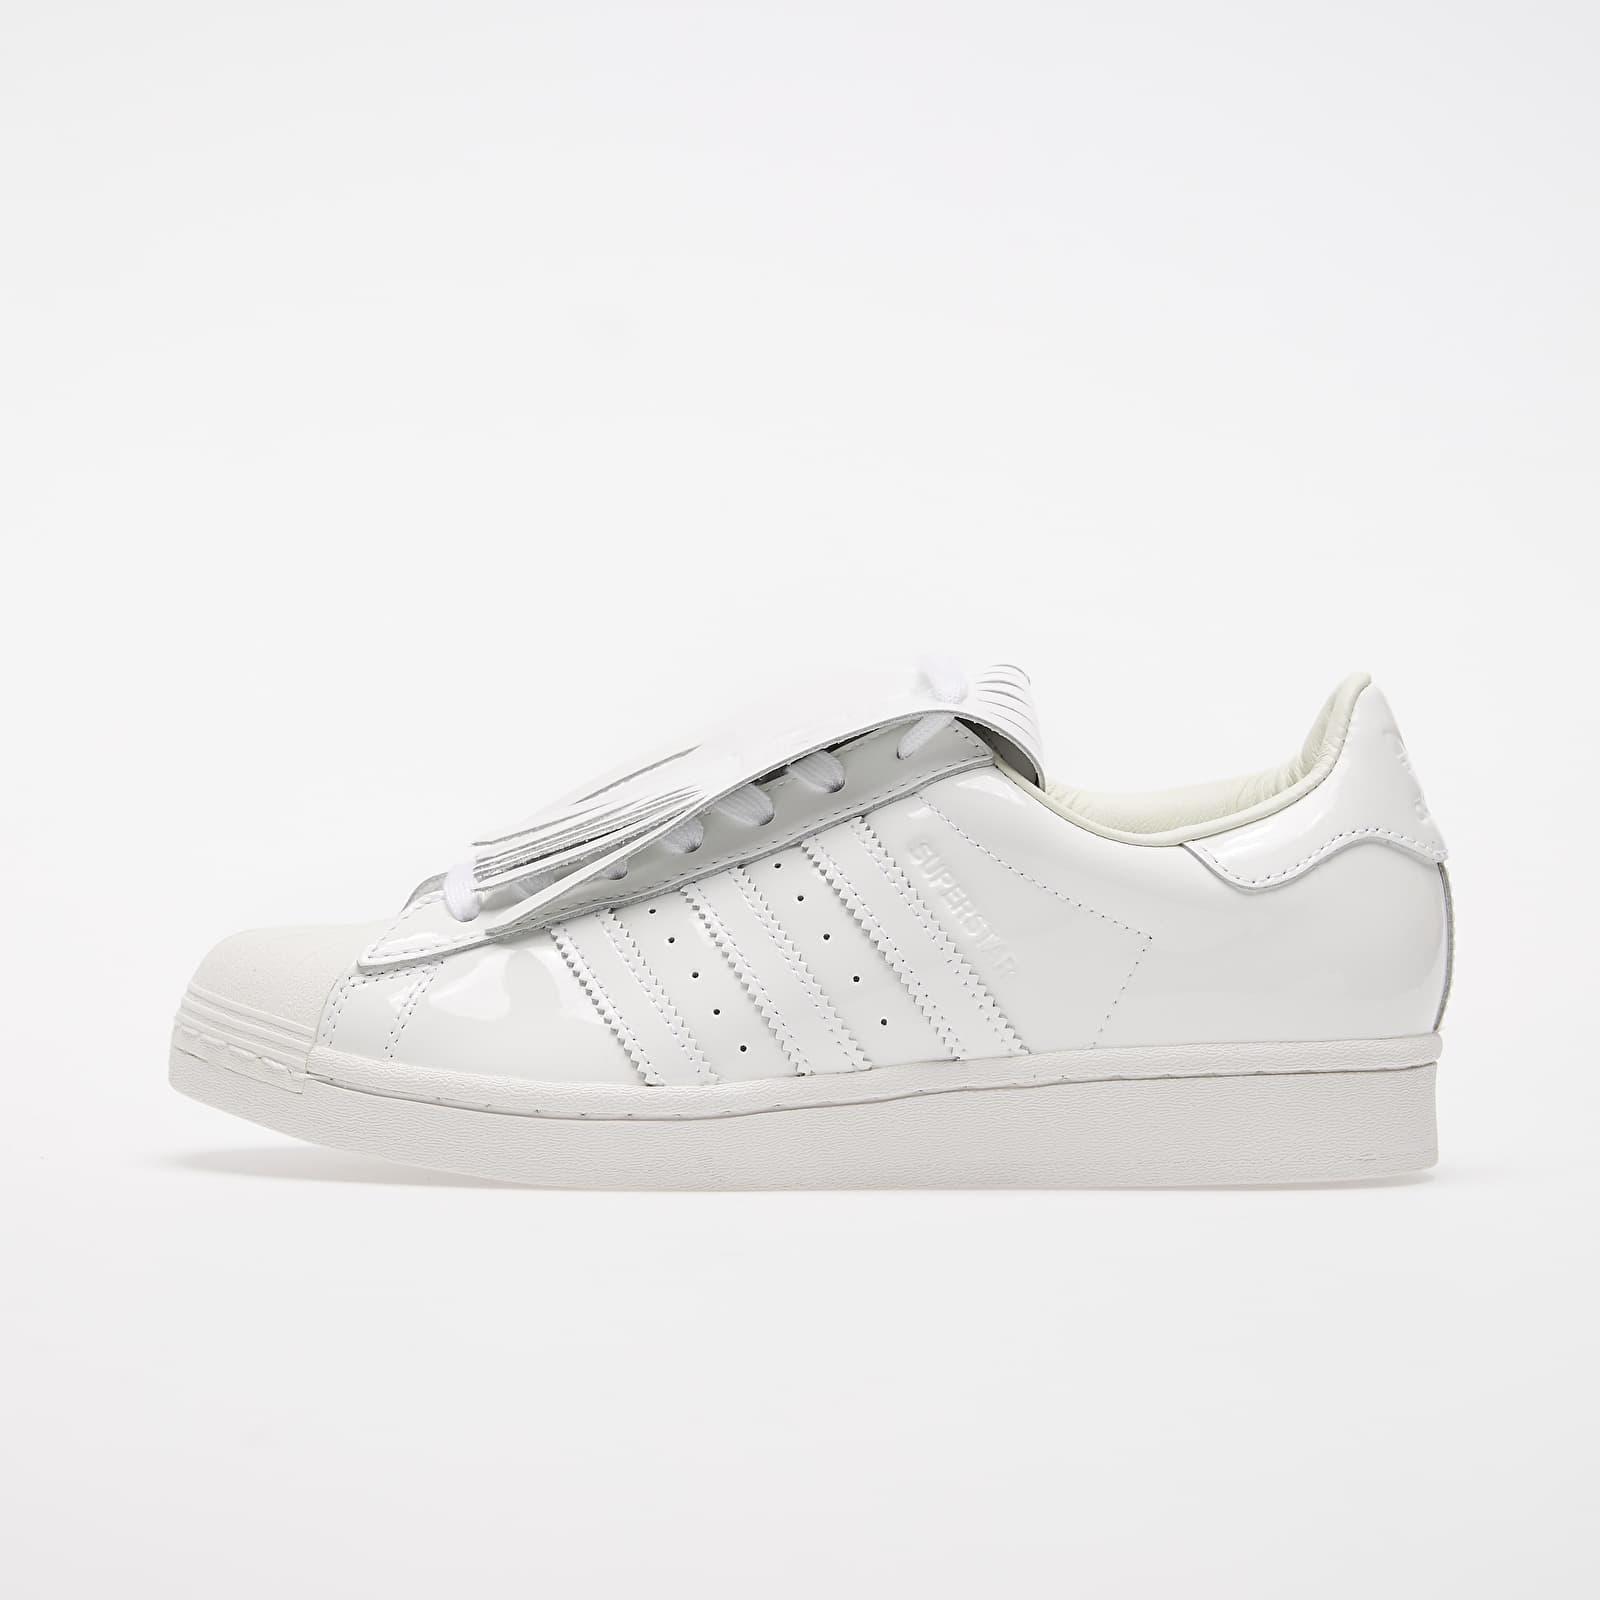 adidas superstar price white